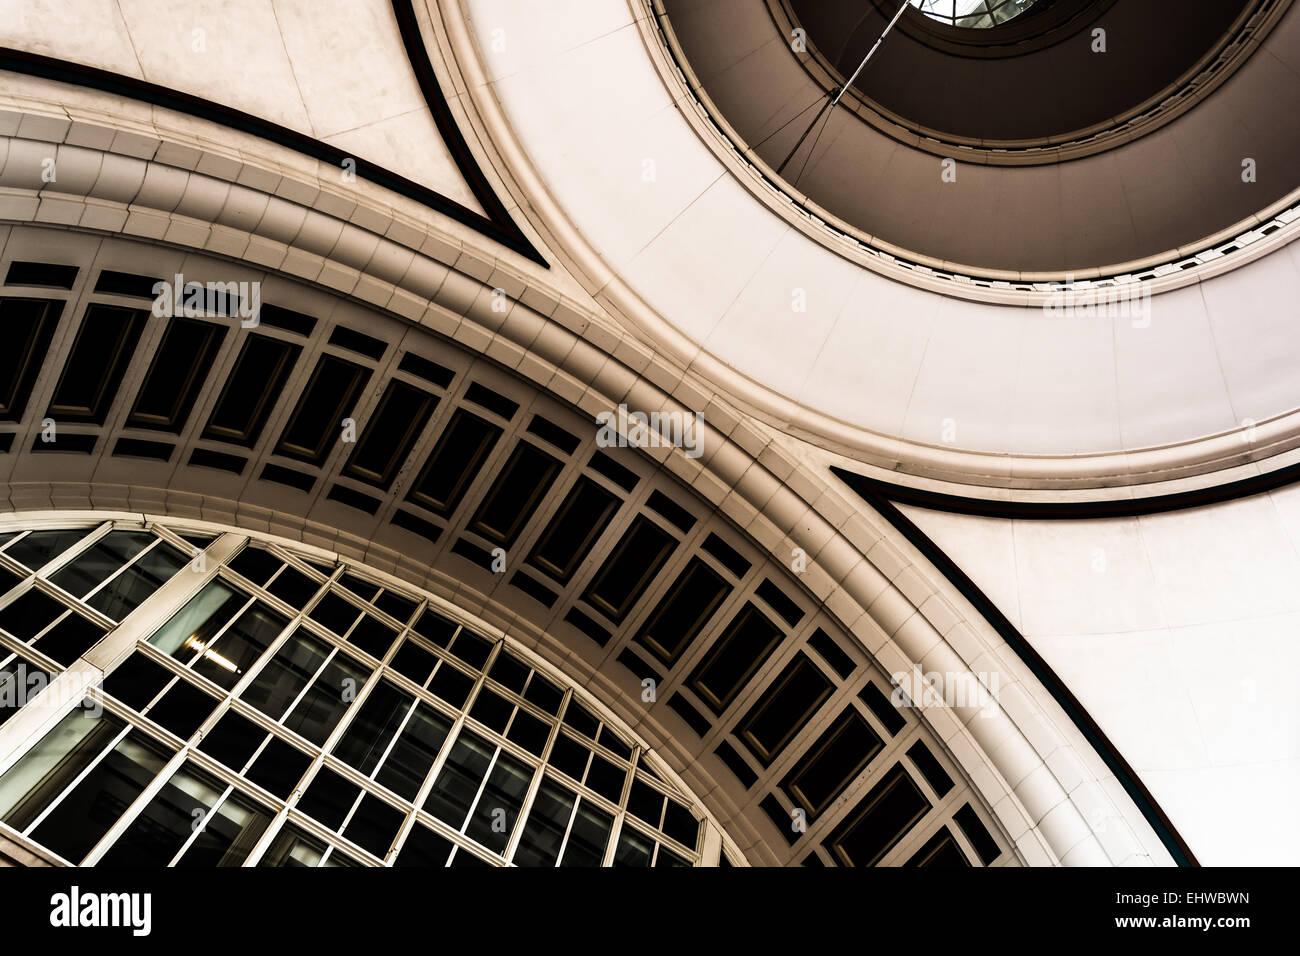 Dentro de la arquitectura Rowes Wharf, en Boston, Massachusetts. Imagen De Stock